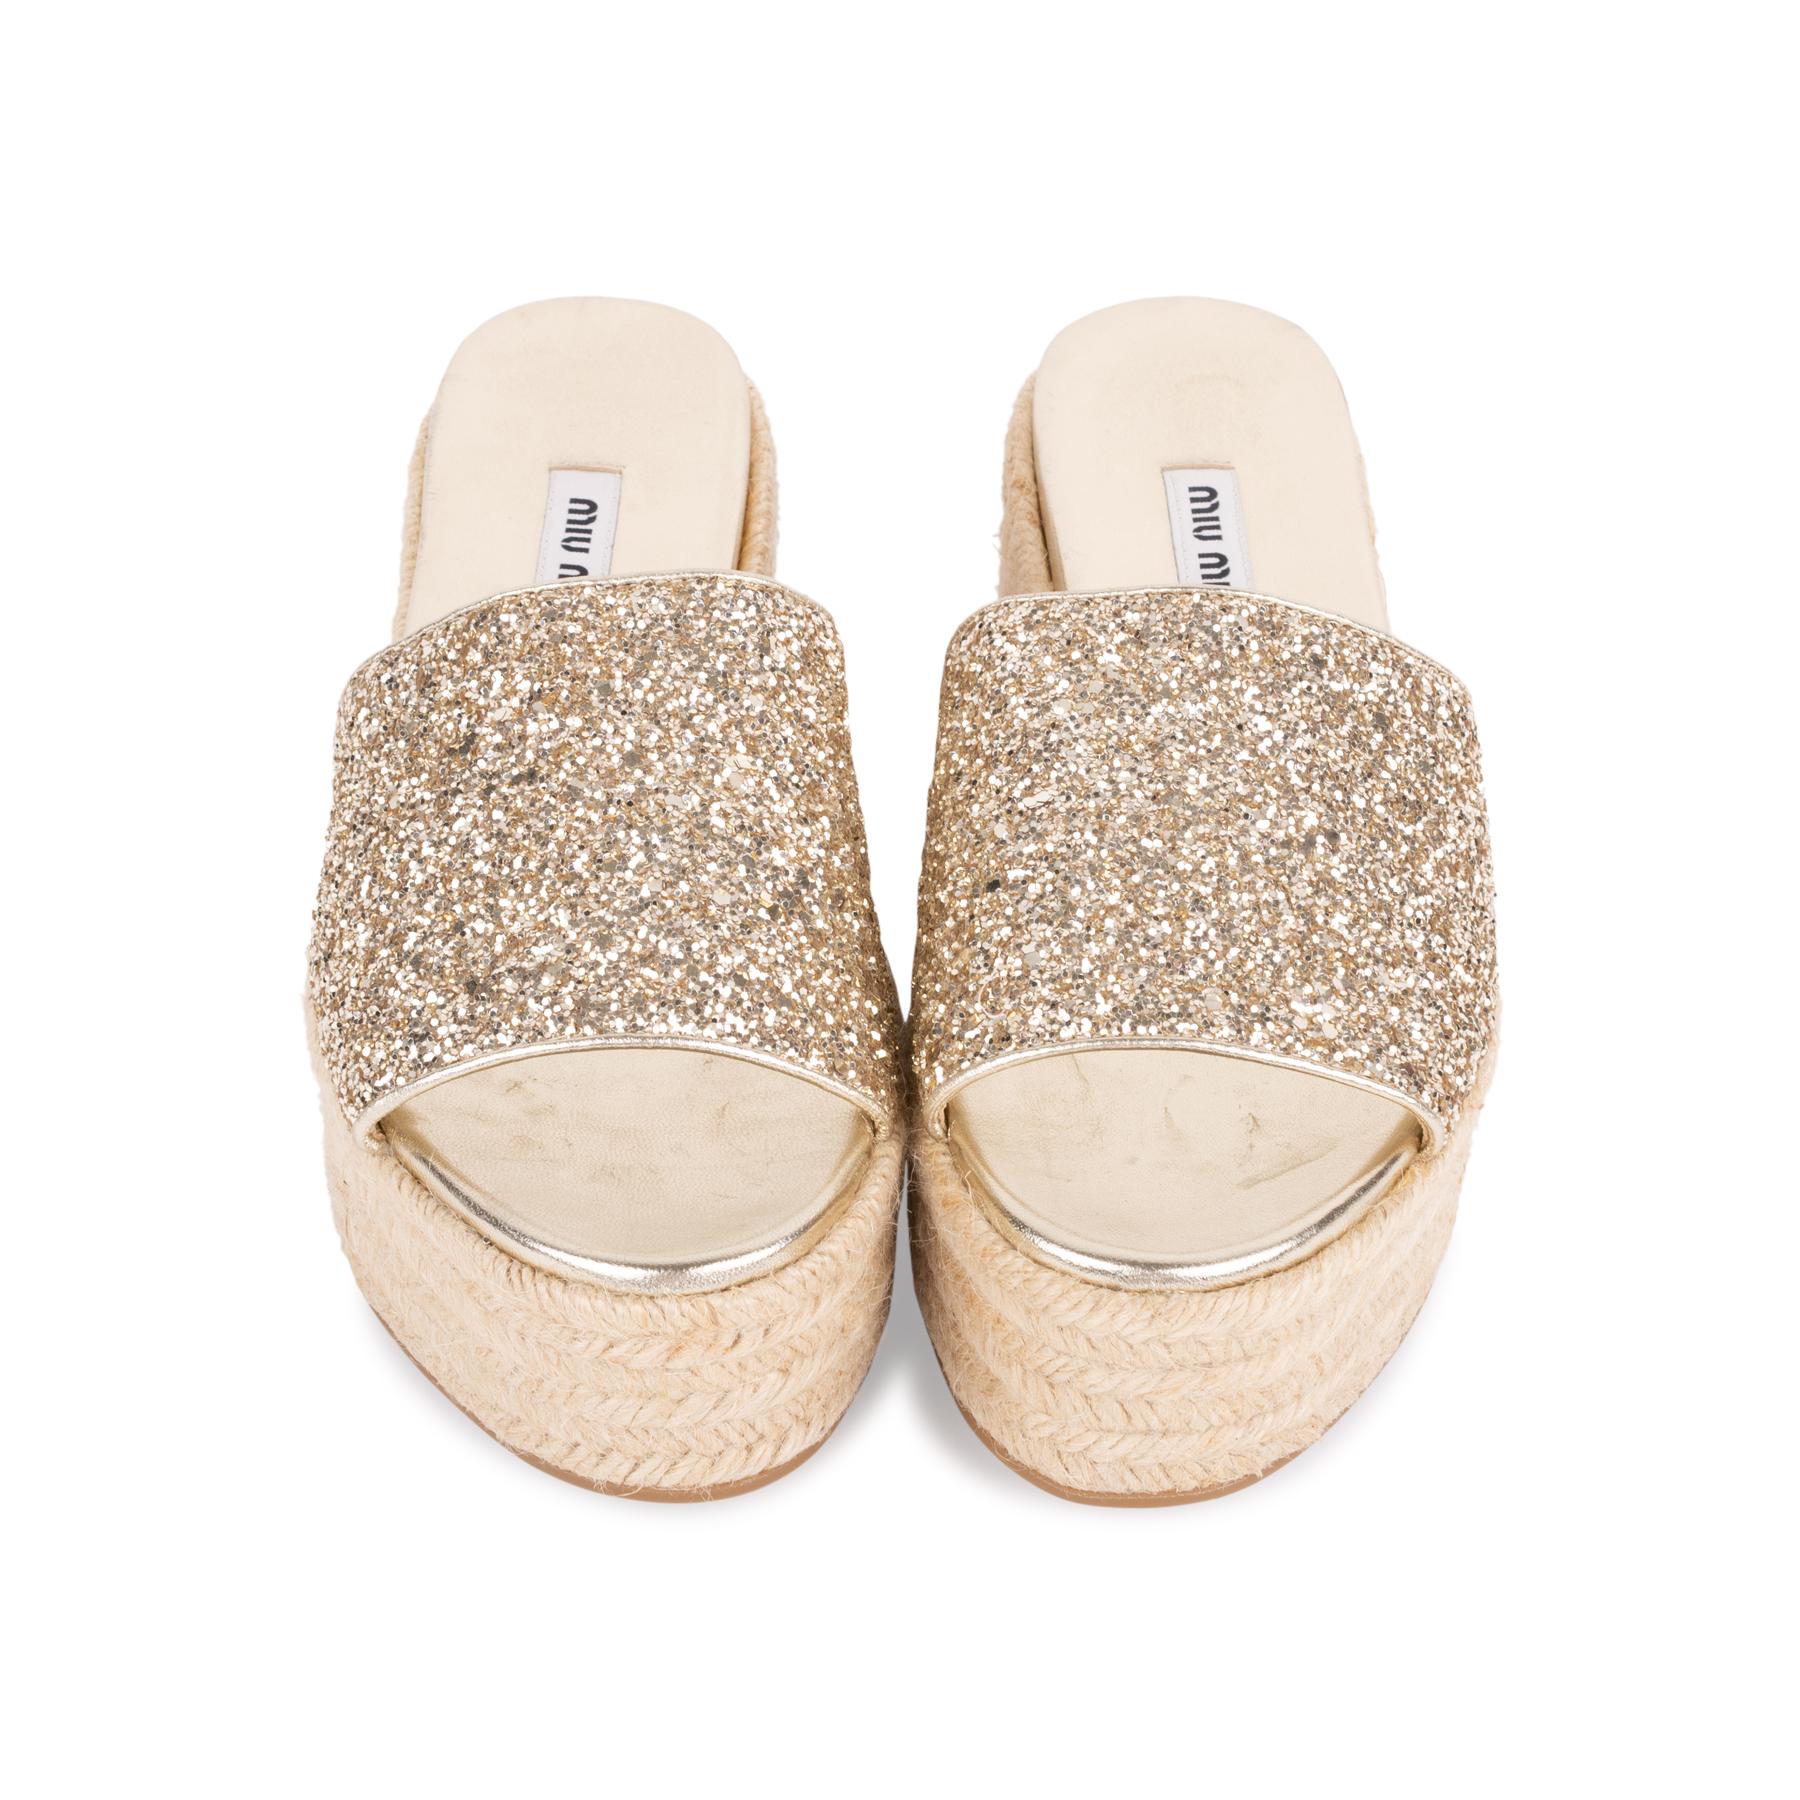 f2cc636efc9 Authentic Second Hand Miu Miu Glitter Platform Espadrille Sandals  (PSS-049-00078)